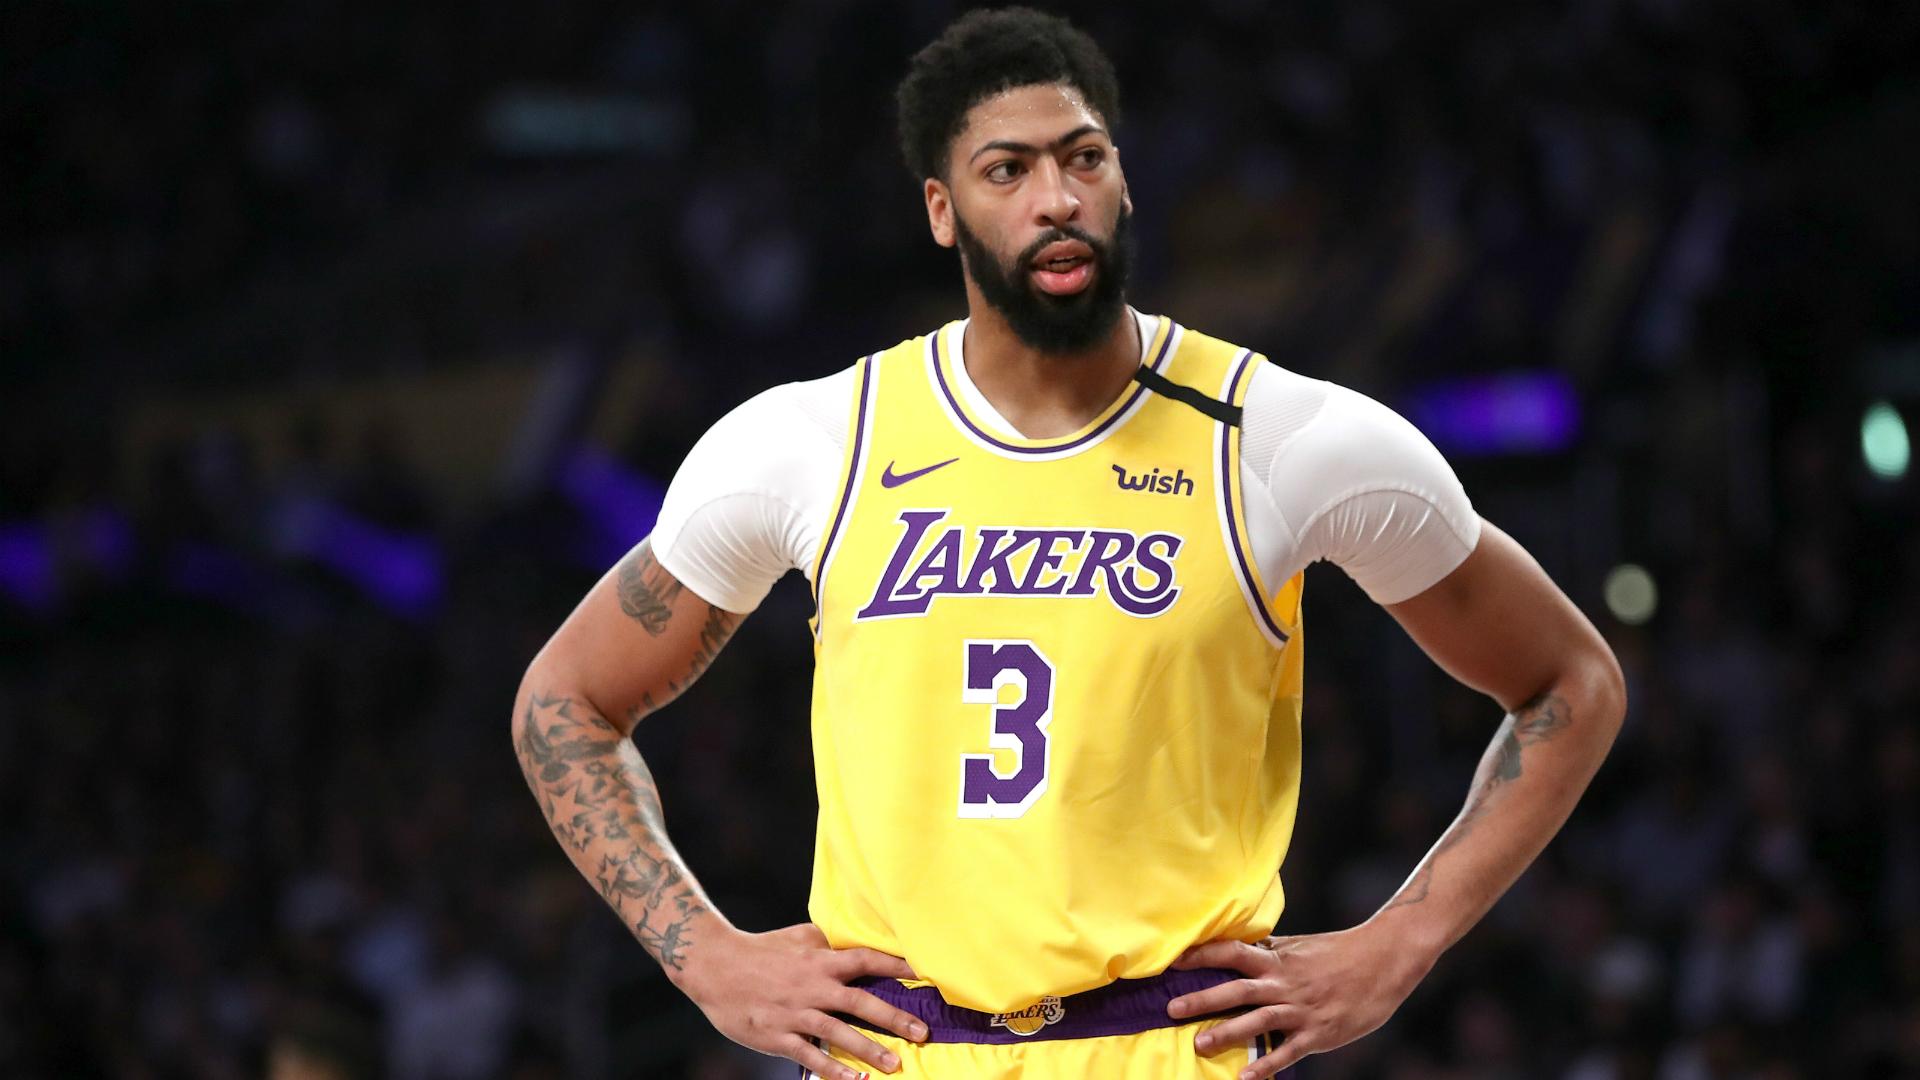 Lakers star Davis 'getting closer' to return